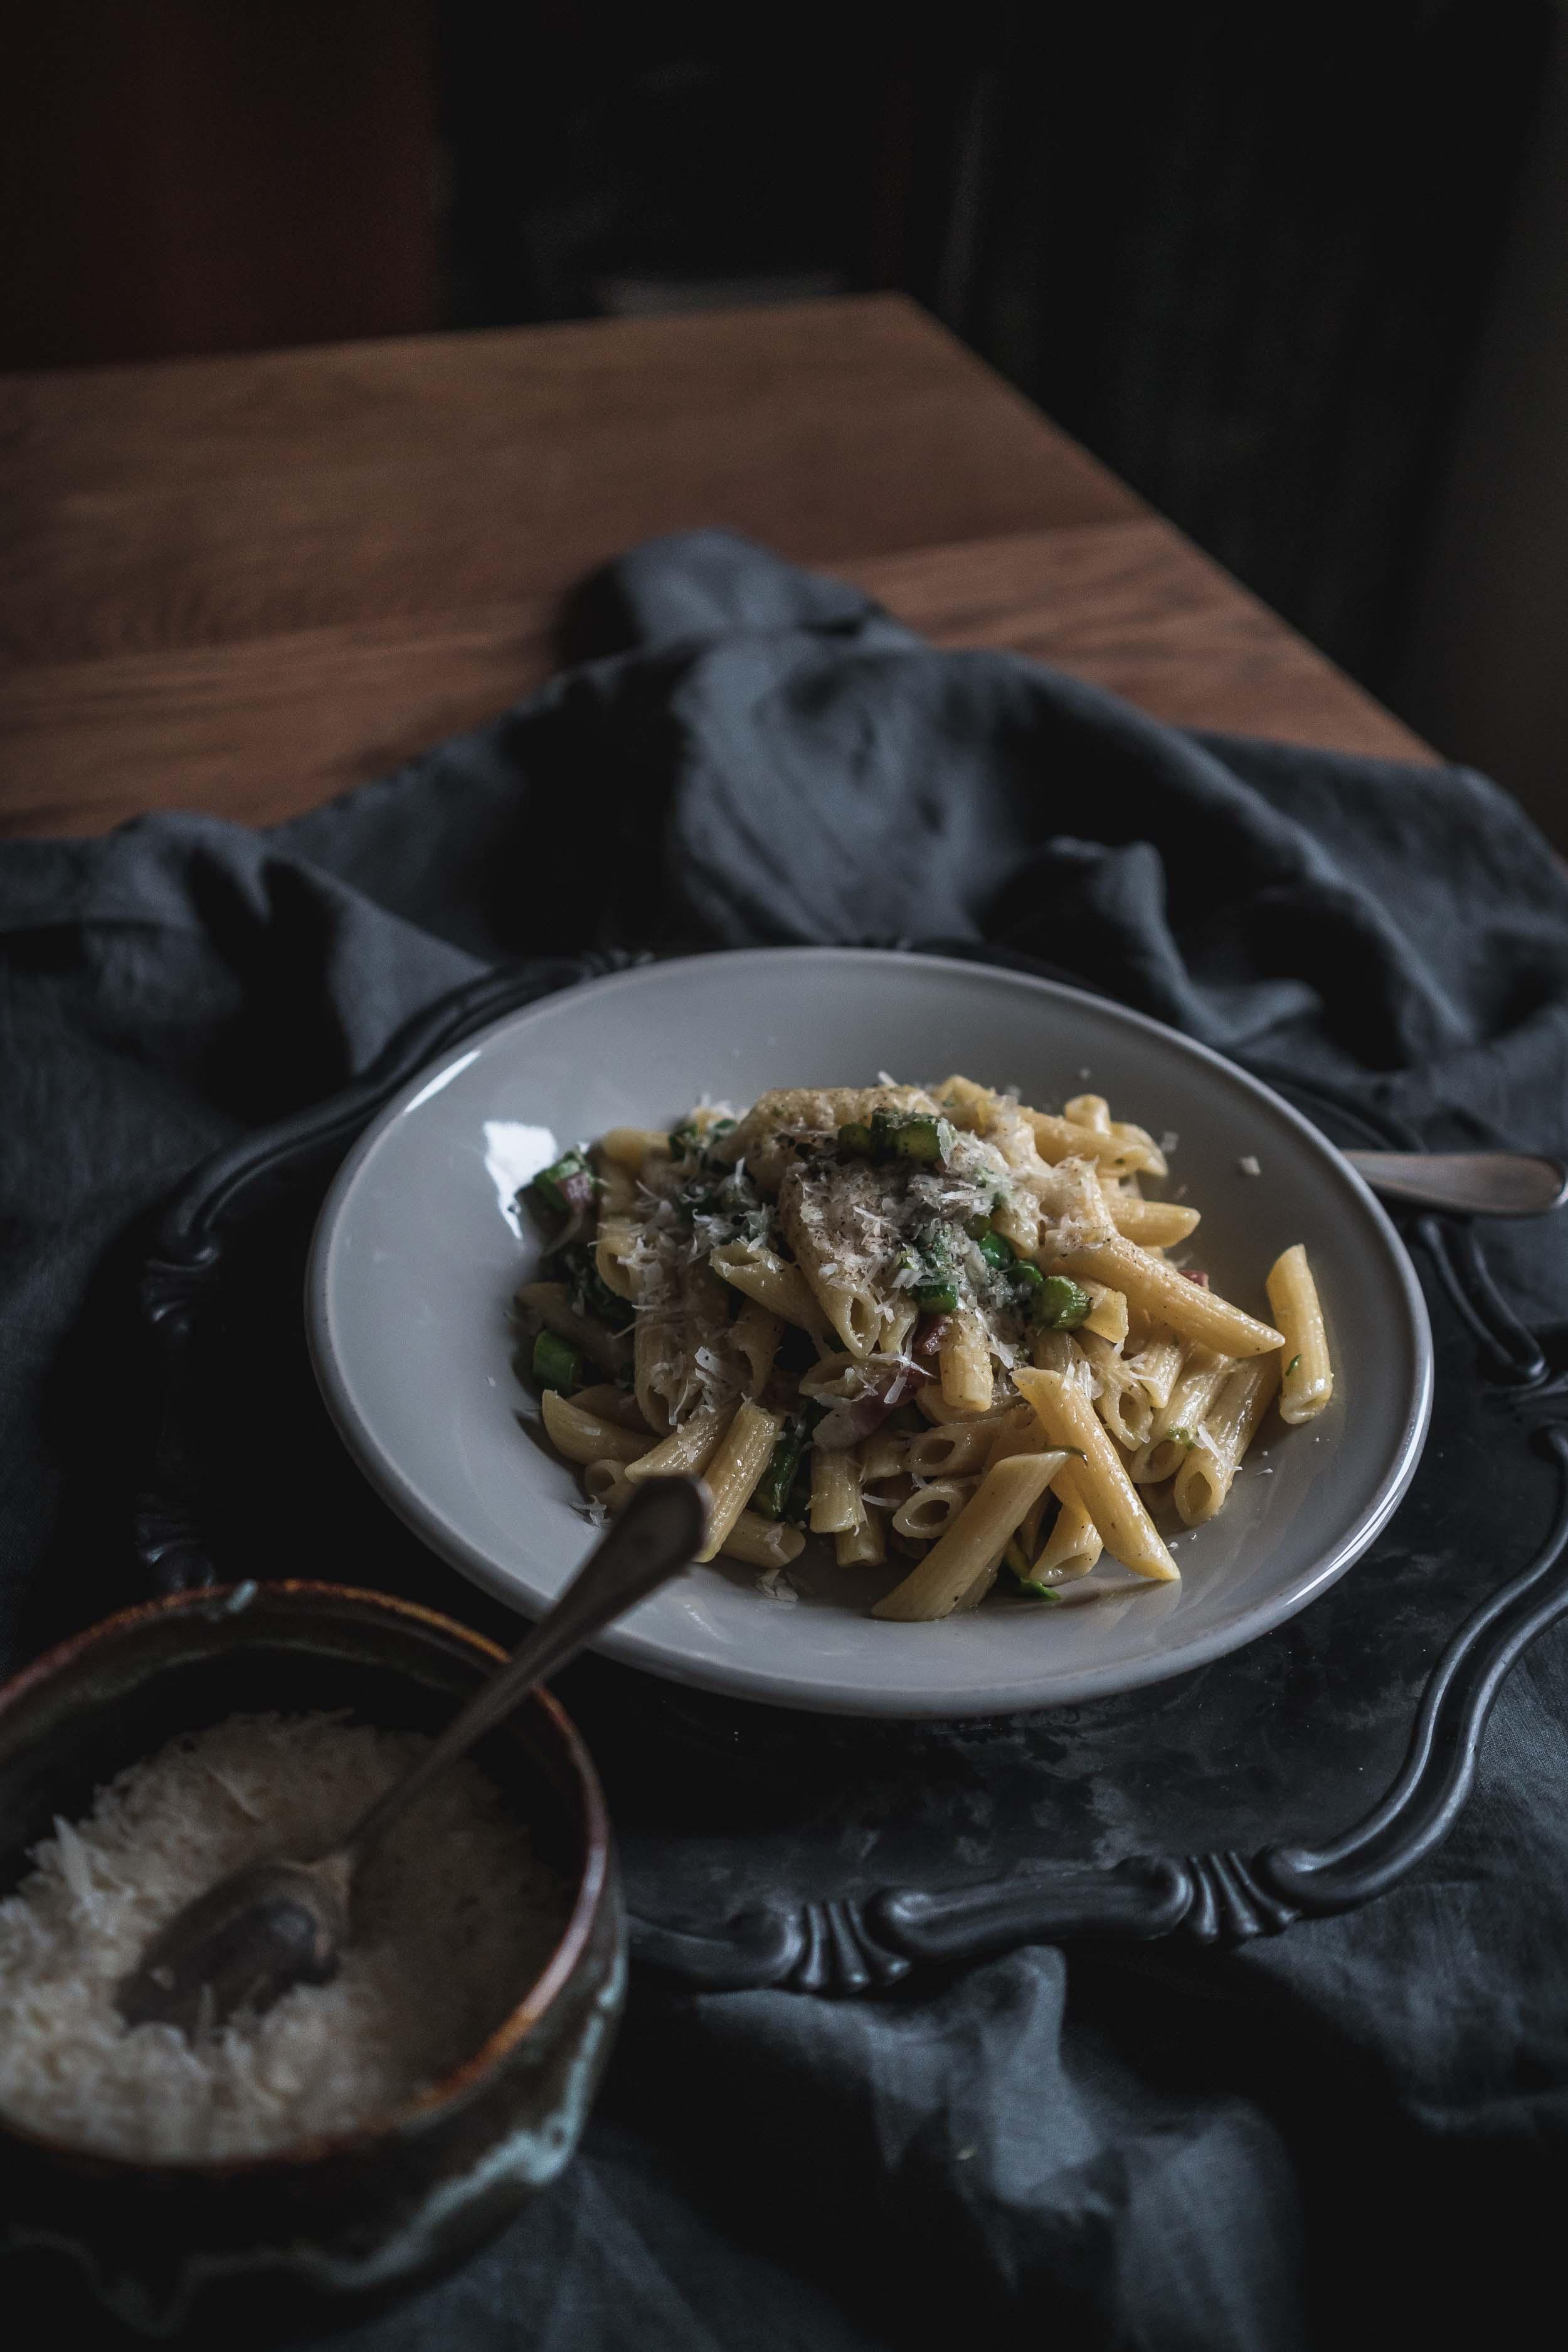 Asparagus-and-Bacon-Penne-Pasta-05142.jpg